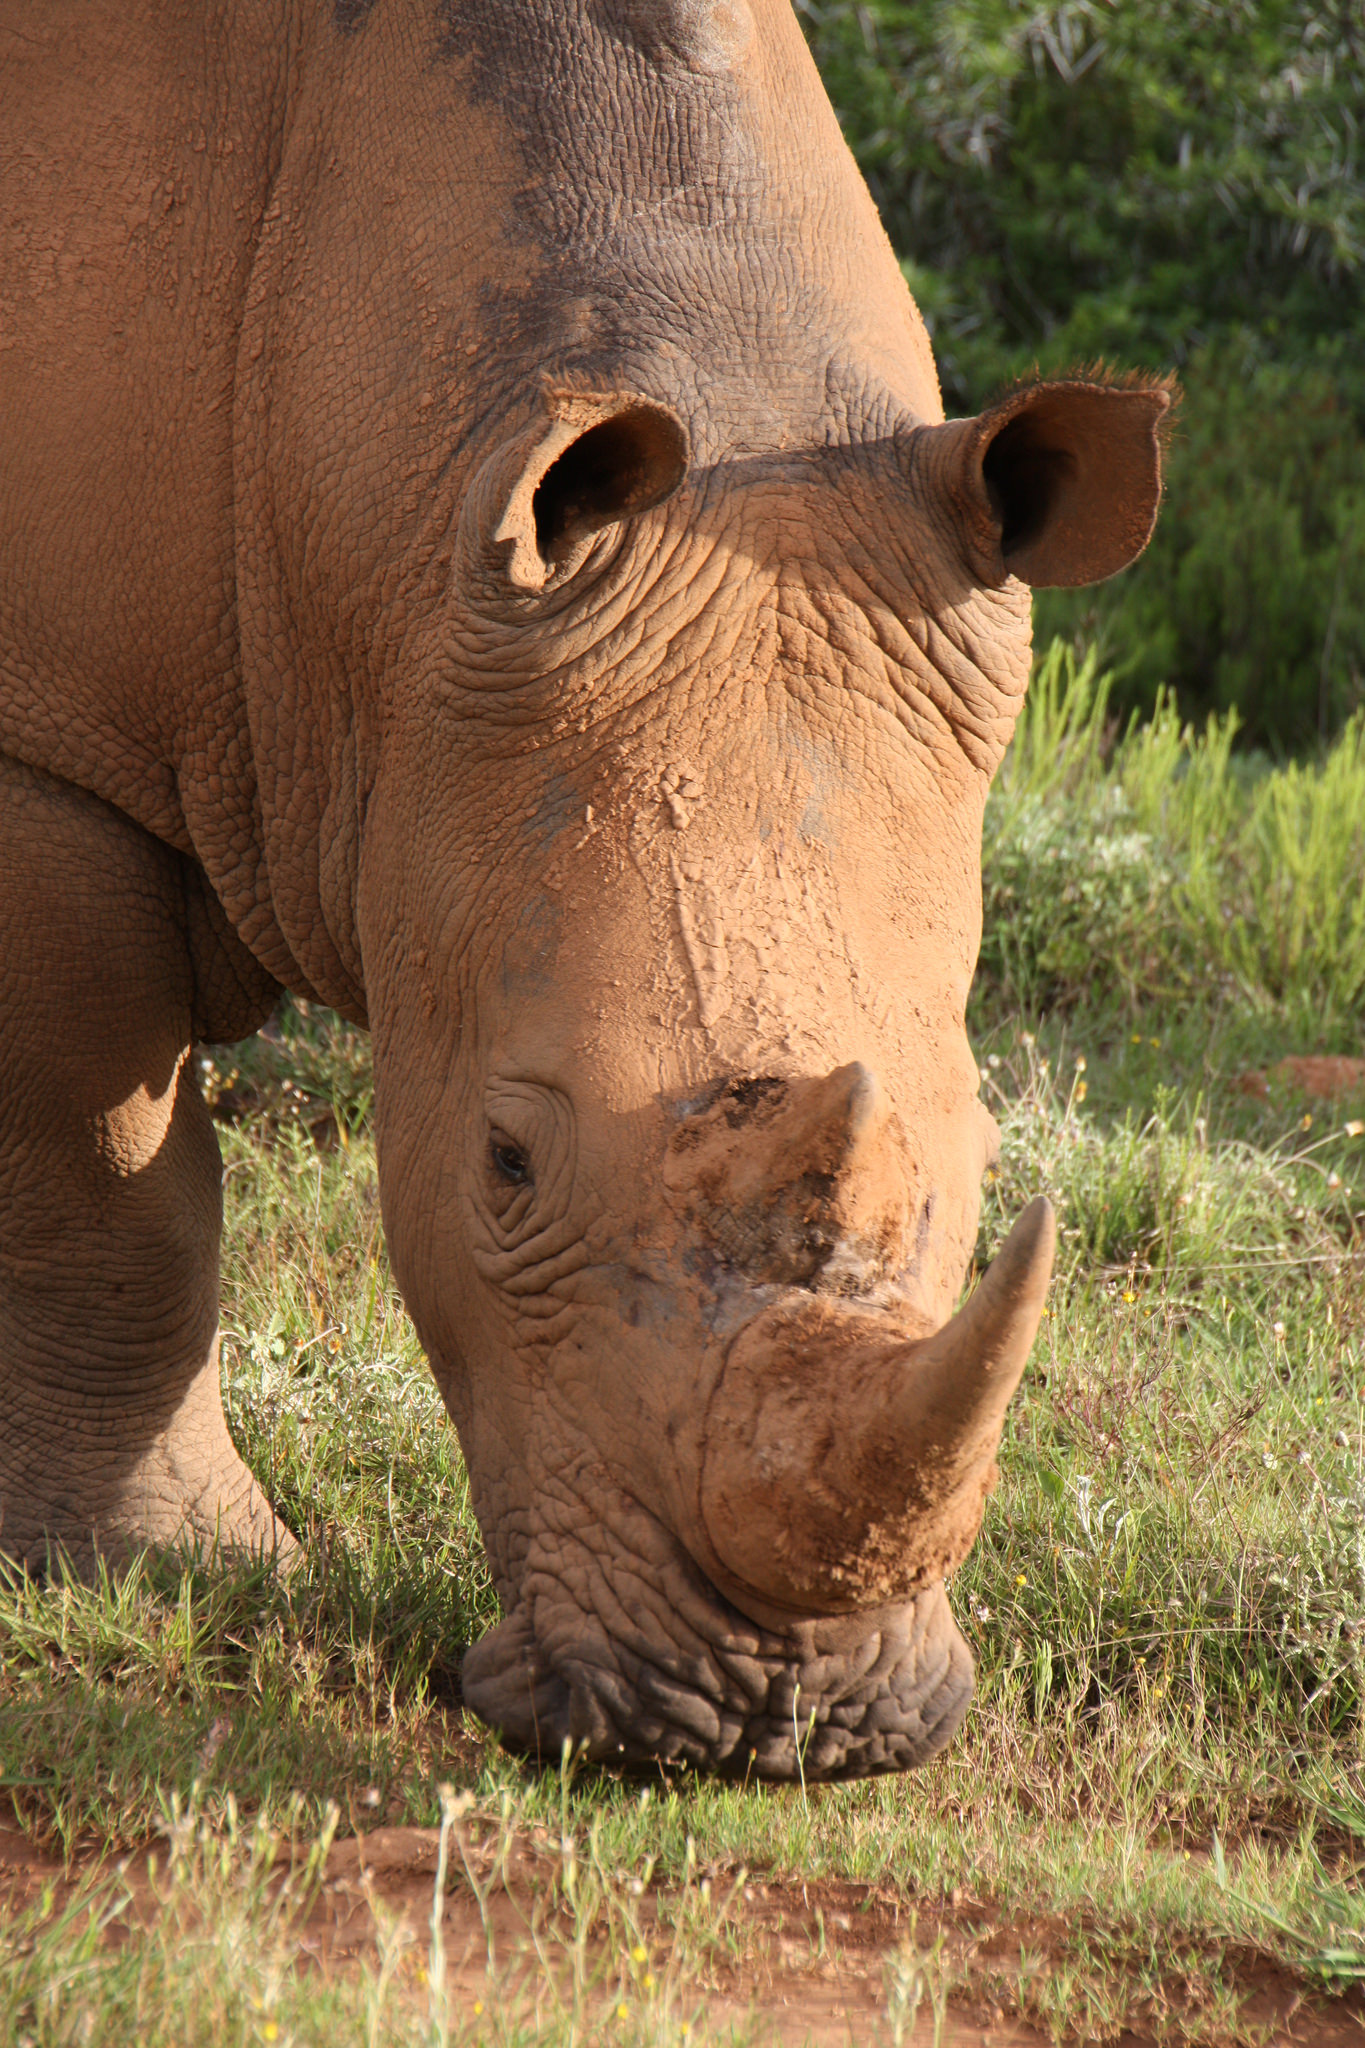 rhinoceros browsing on grass